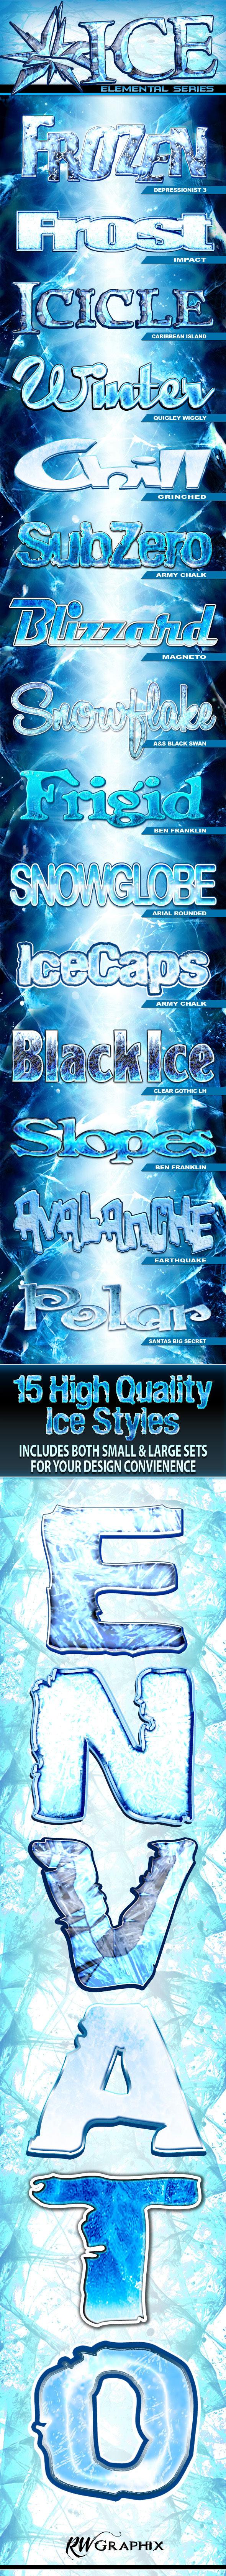 Elemental ICE - Series 1 - Styles Photoshop